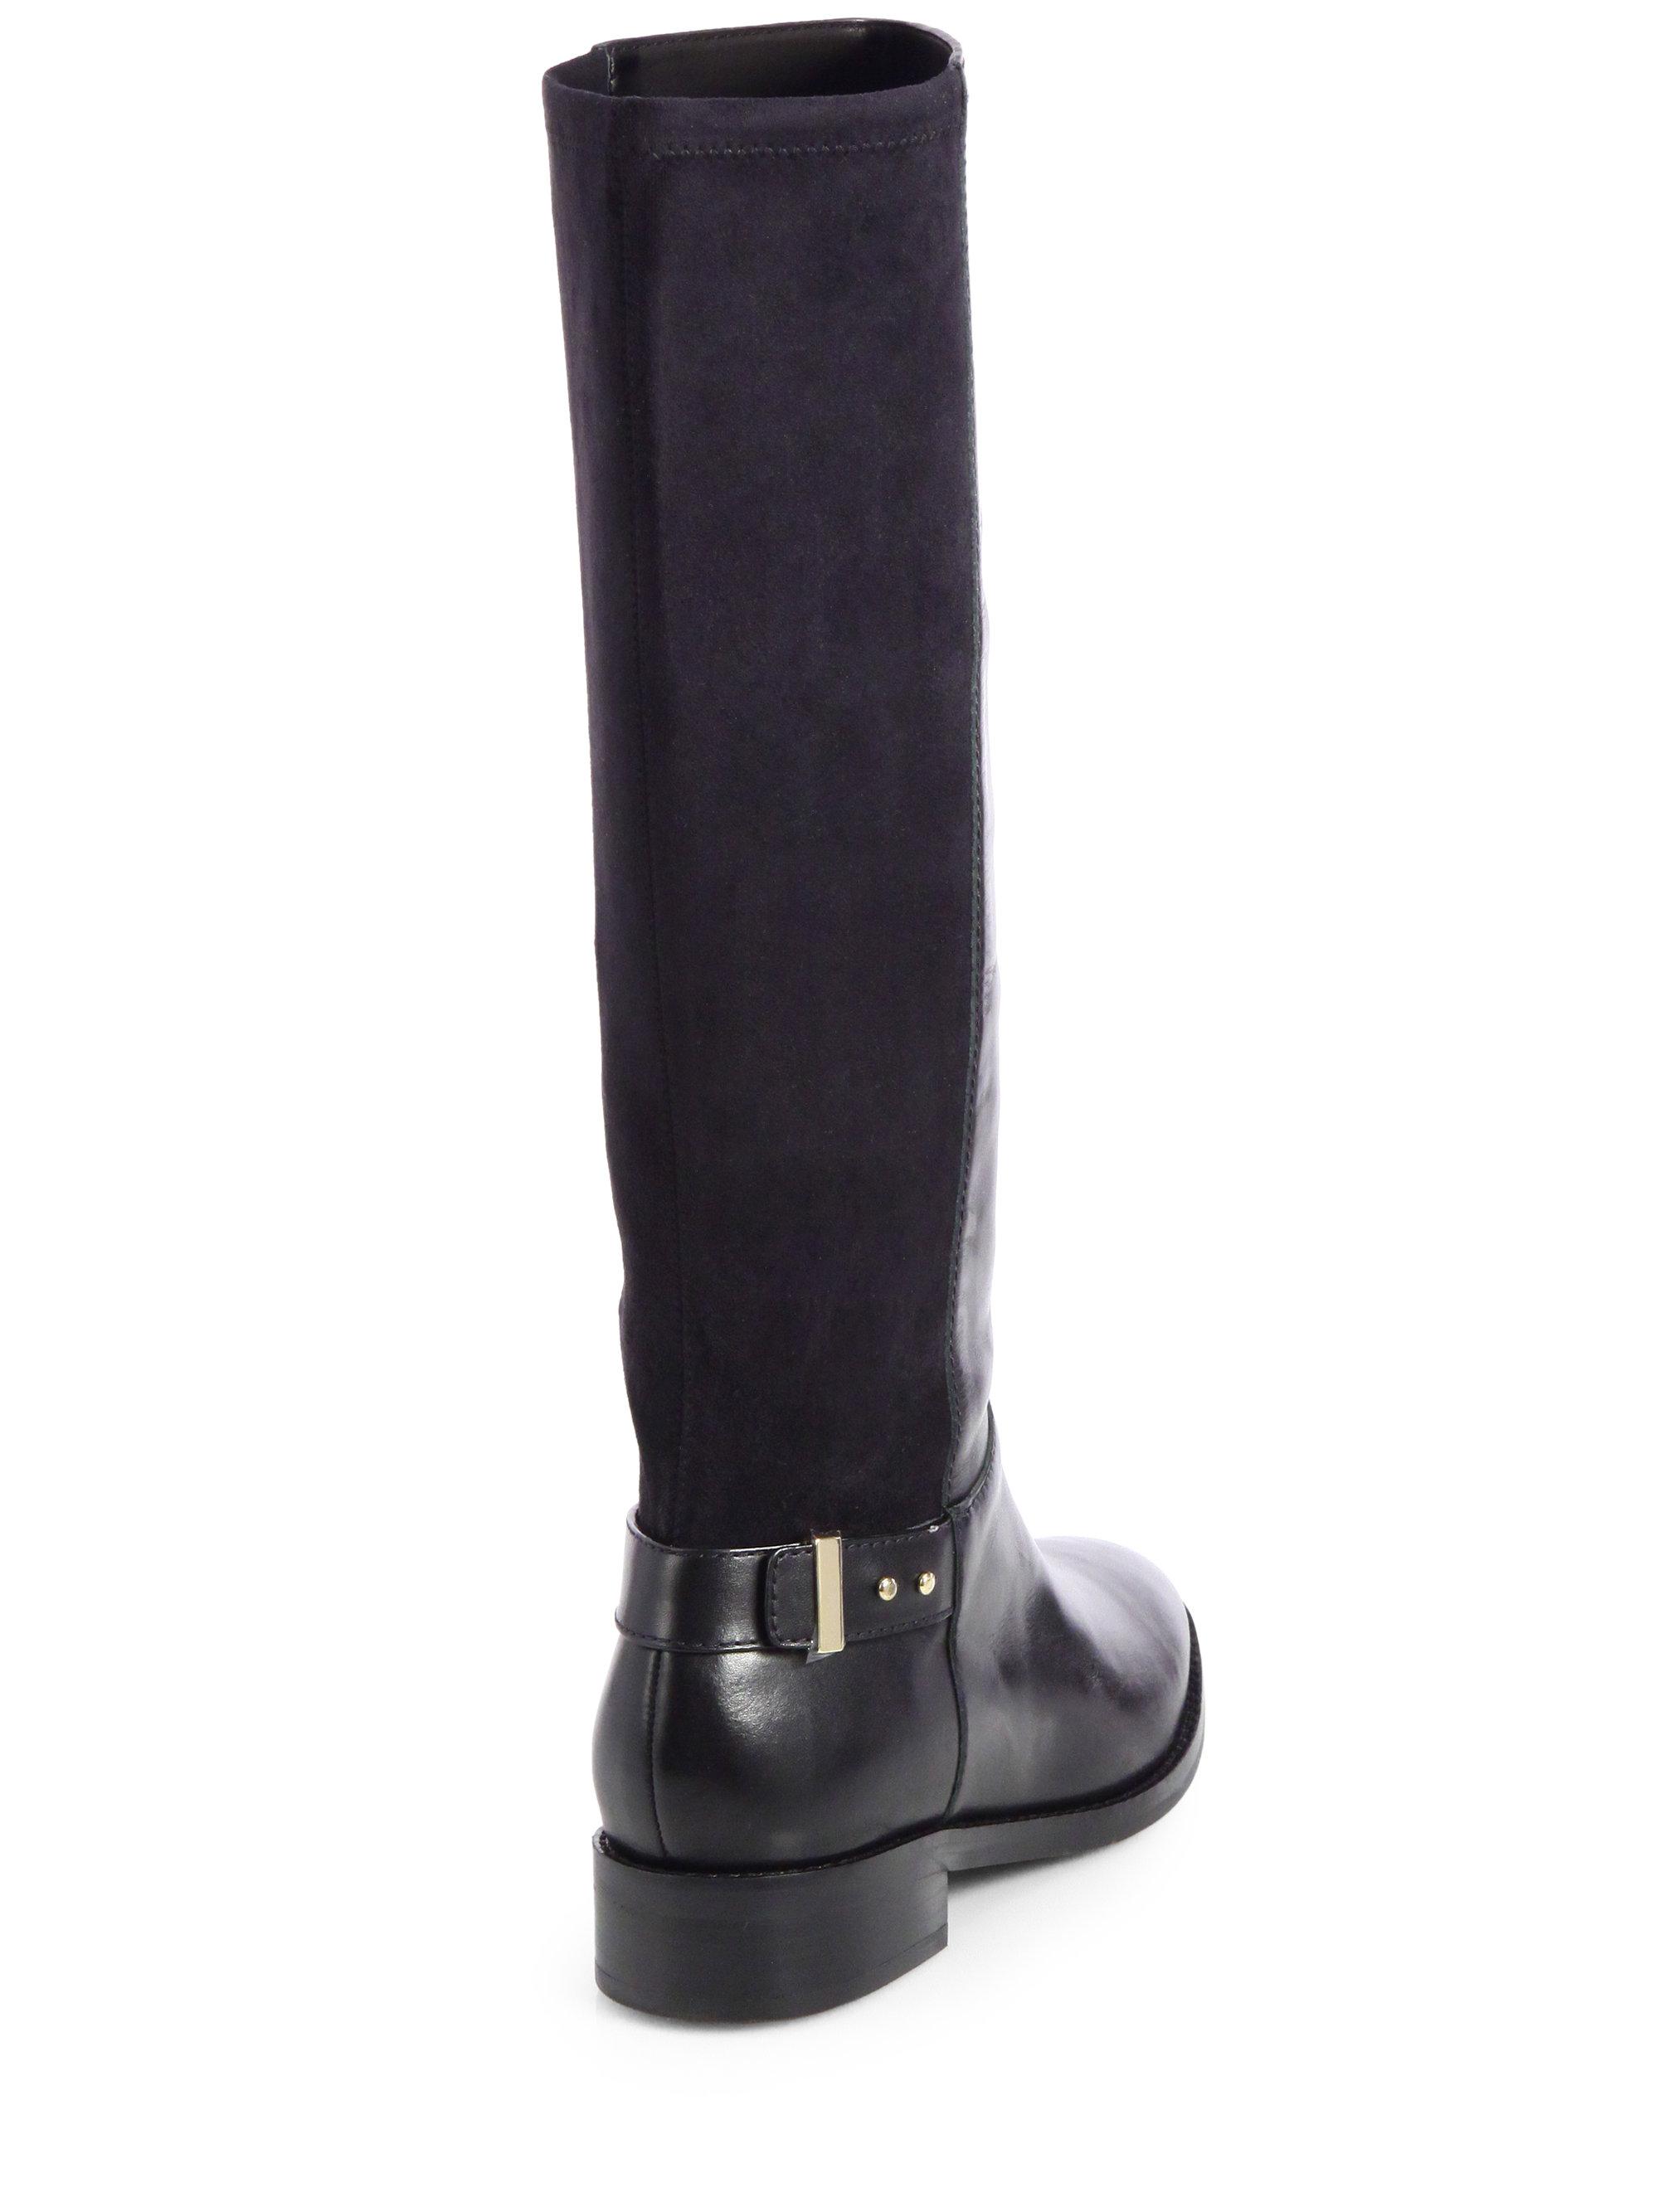 Cole haan Adler Leather Suede Kneehigh Boots in Black | Lyst